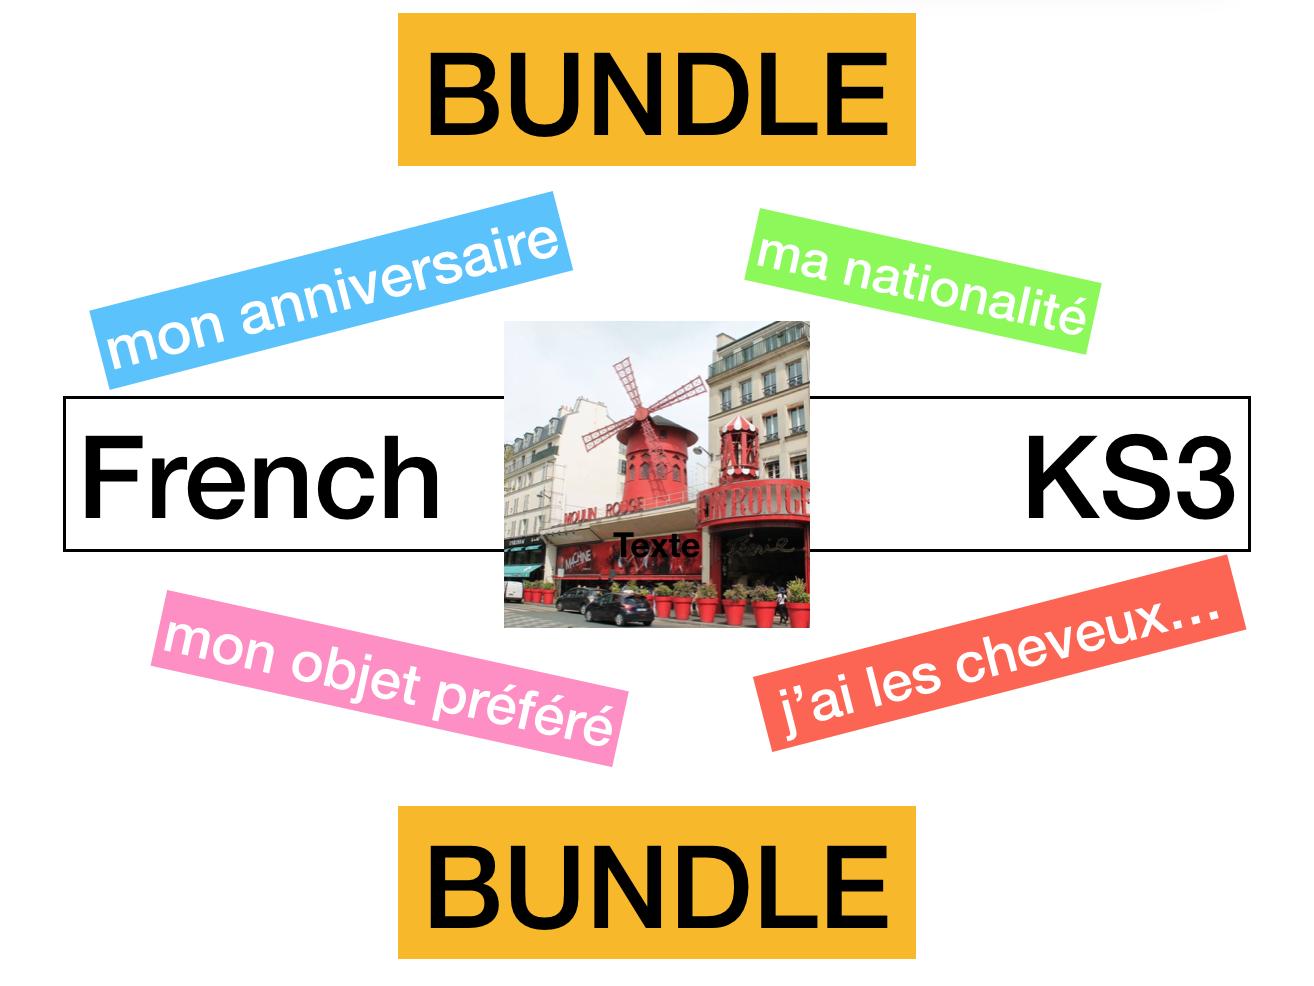 KS3 - French  Allez 1 Tout sur moi. (1.1 / 1.2 / 1.3 / 1.4)